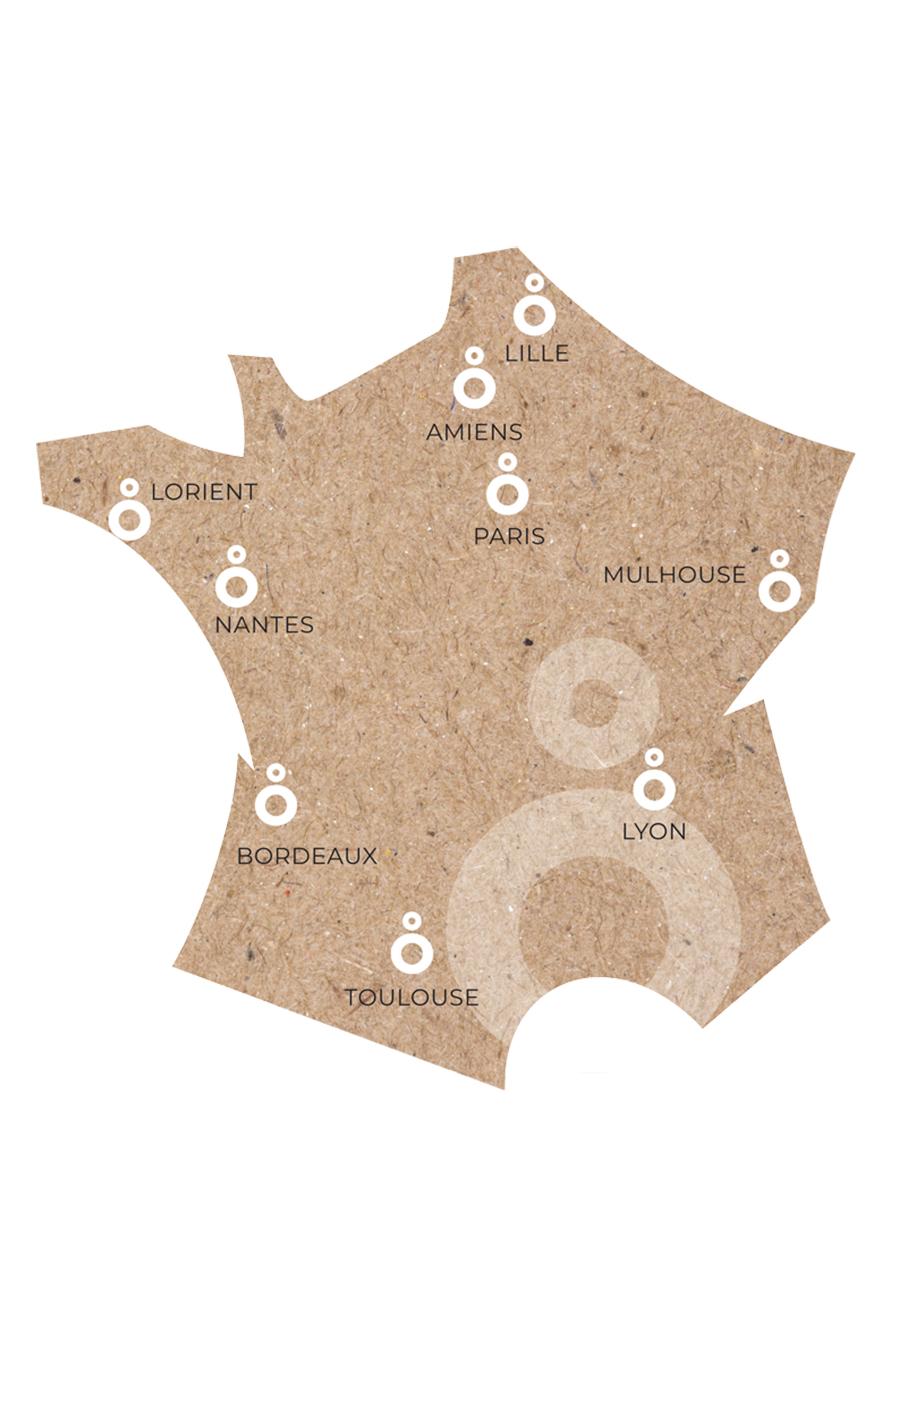 Carte de France Agences OSLO